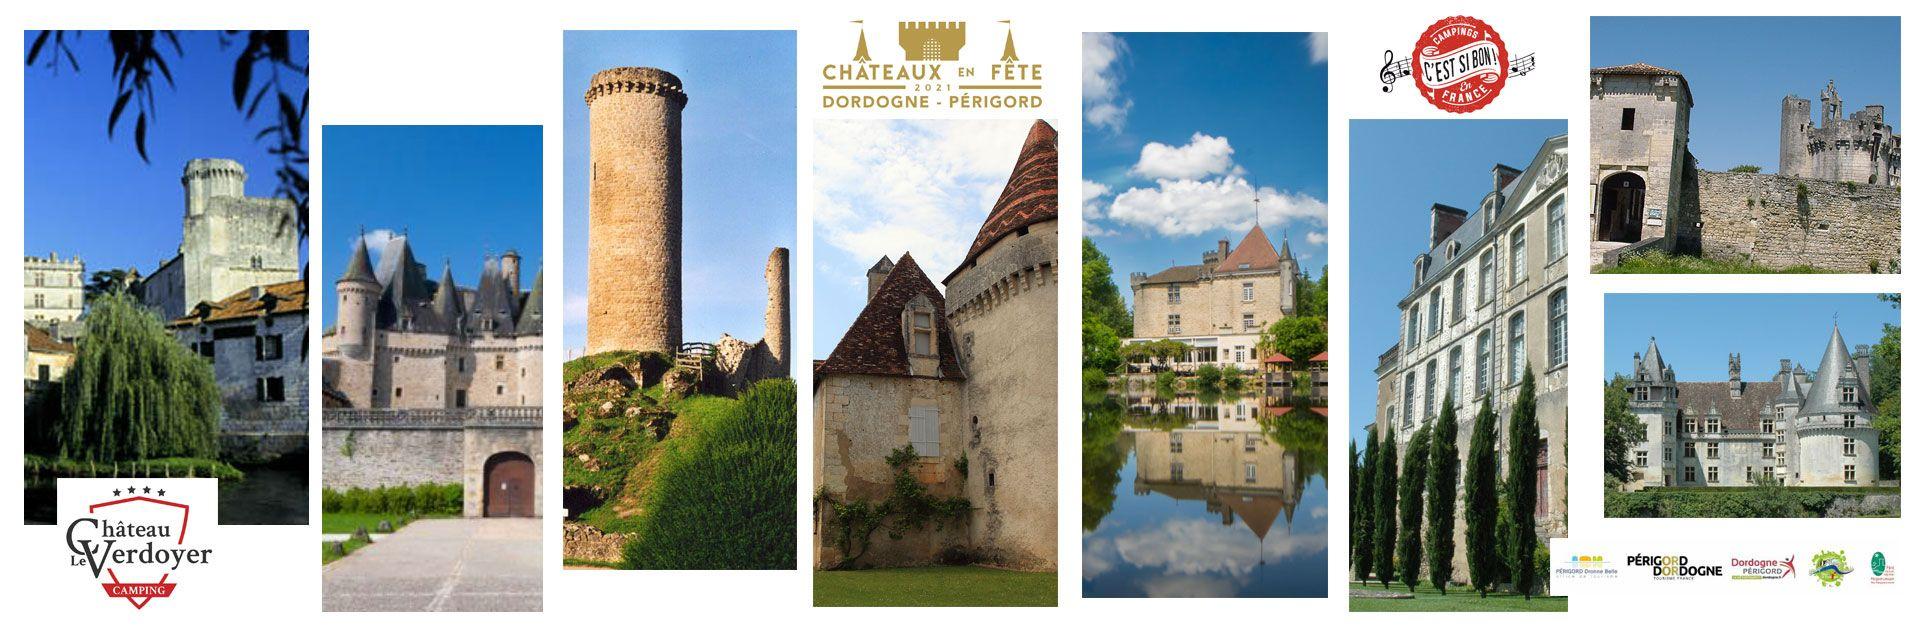 Châteaux en fête Verdoyer Dordogne Périgord Vert Kasteel Kastelenfestival